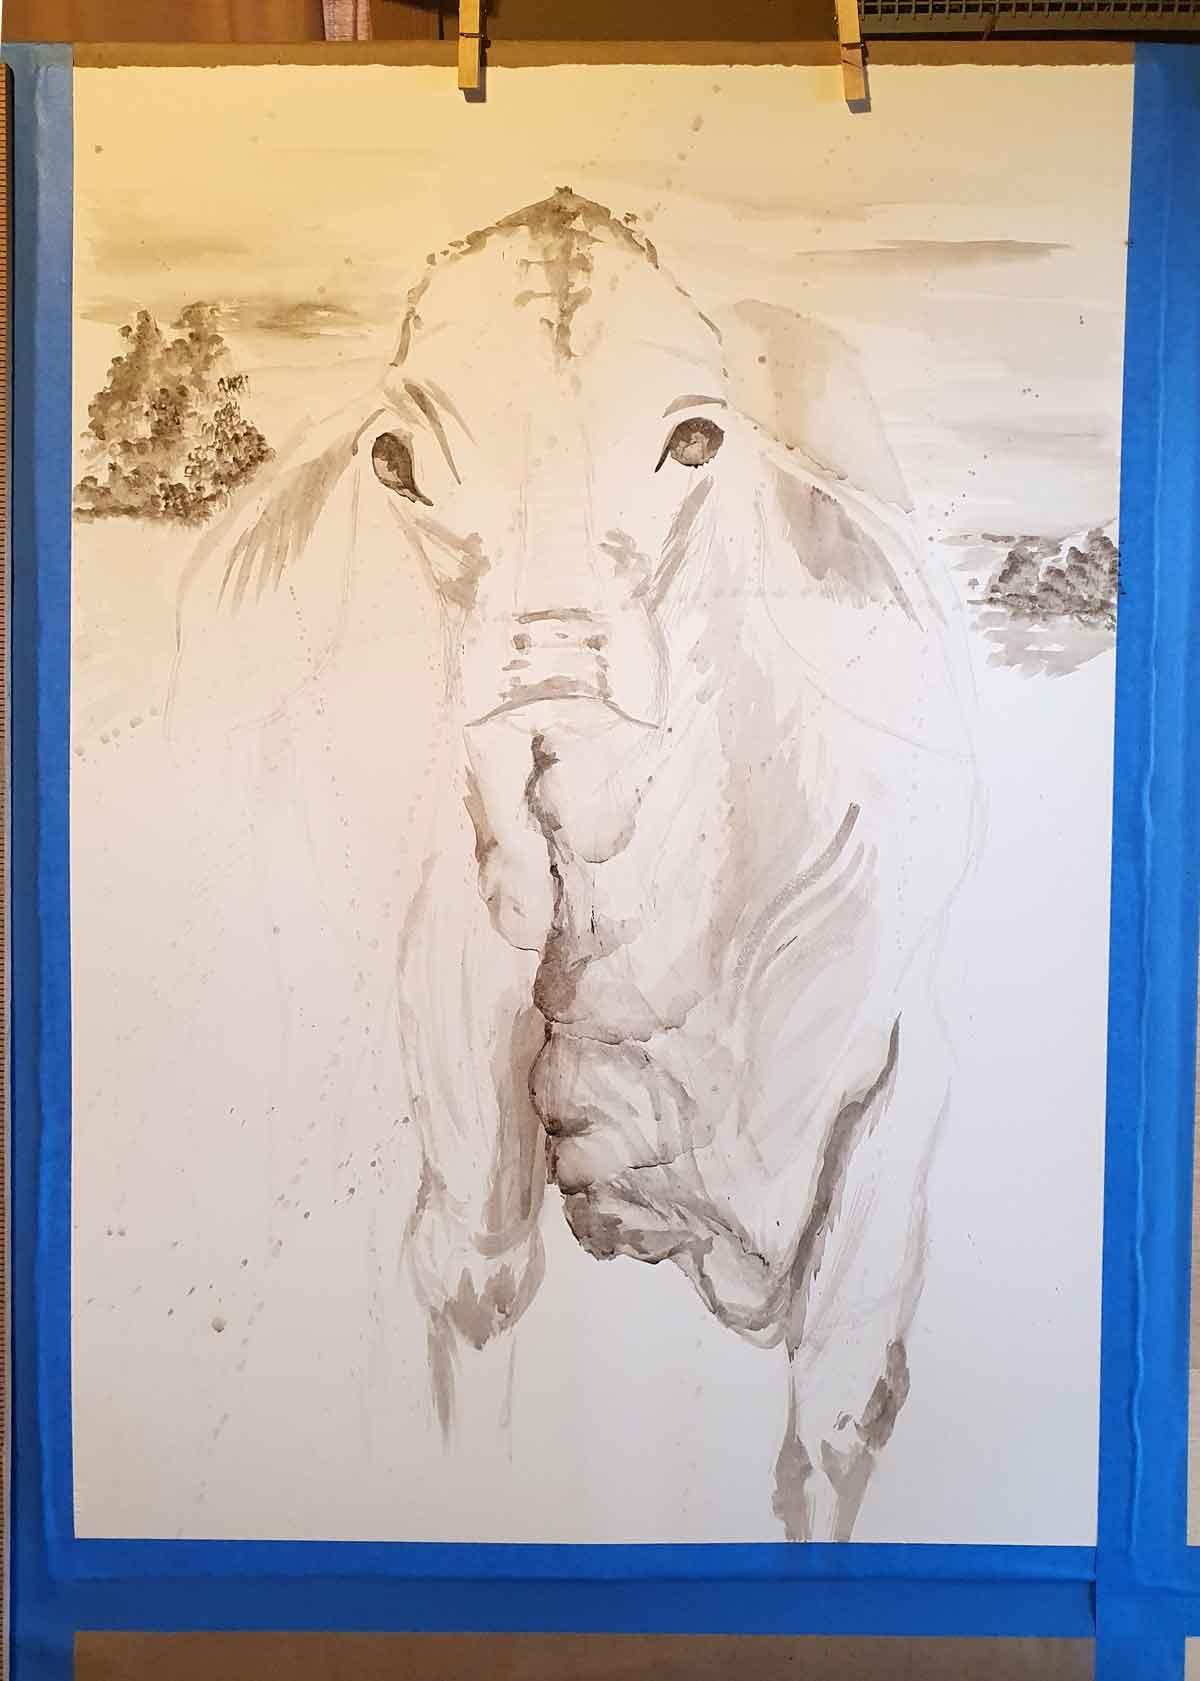 A cow portrait in progress, using bone pigments from Wild Ozark.